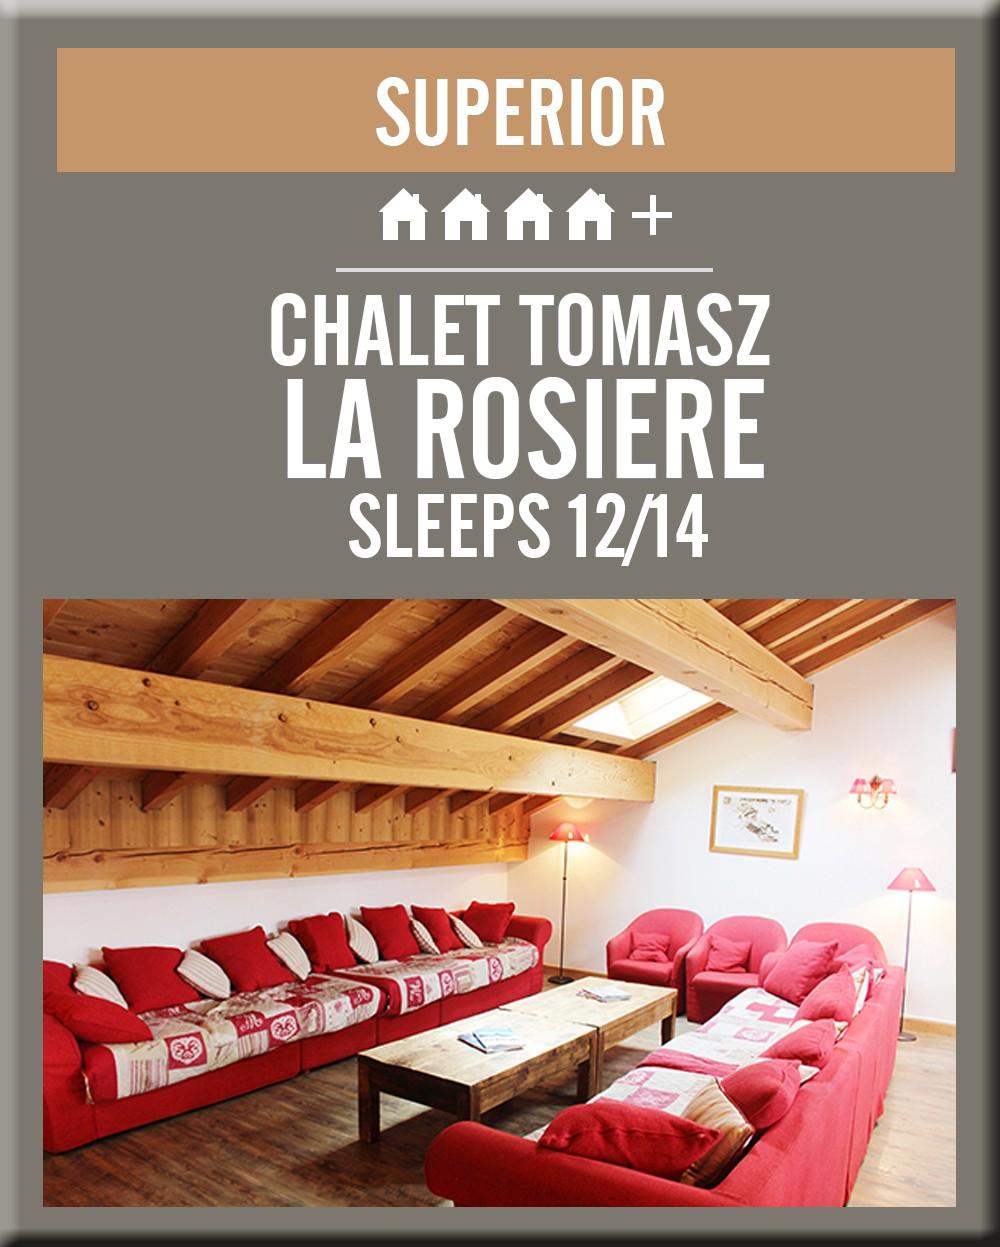 France chalet tomasz la rosiere lounge